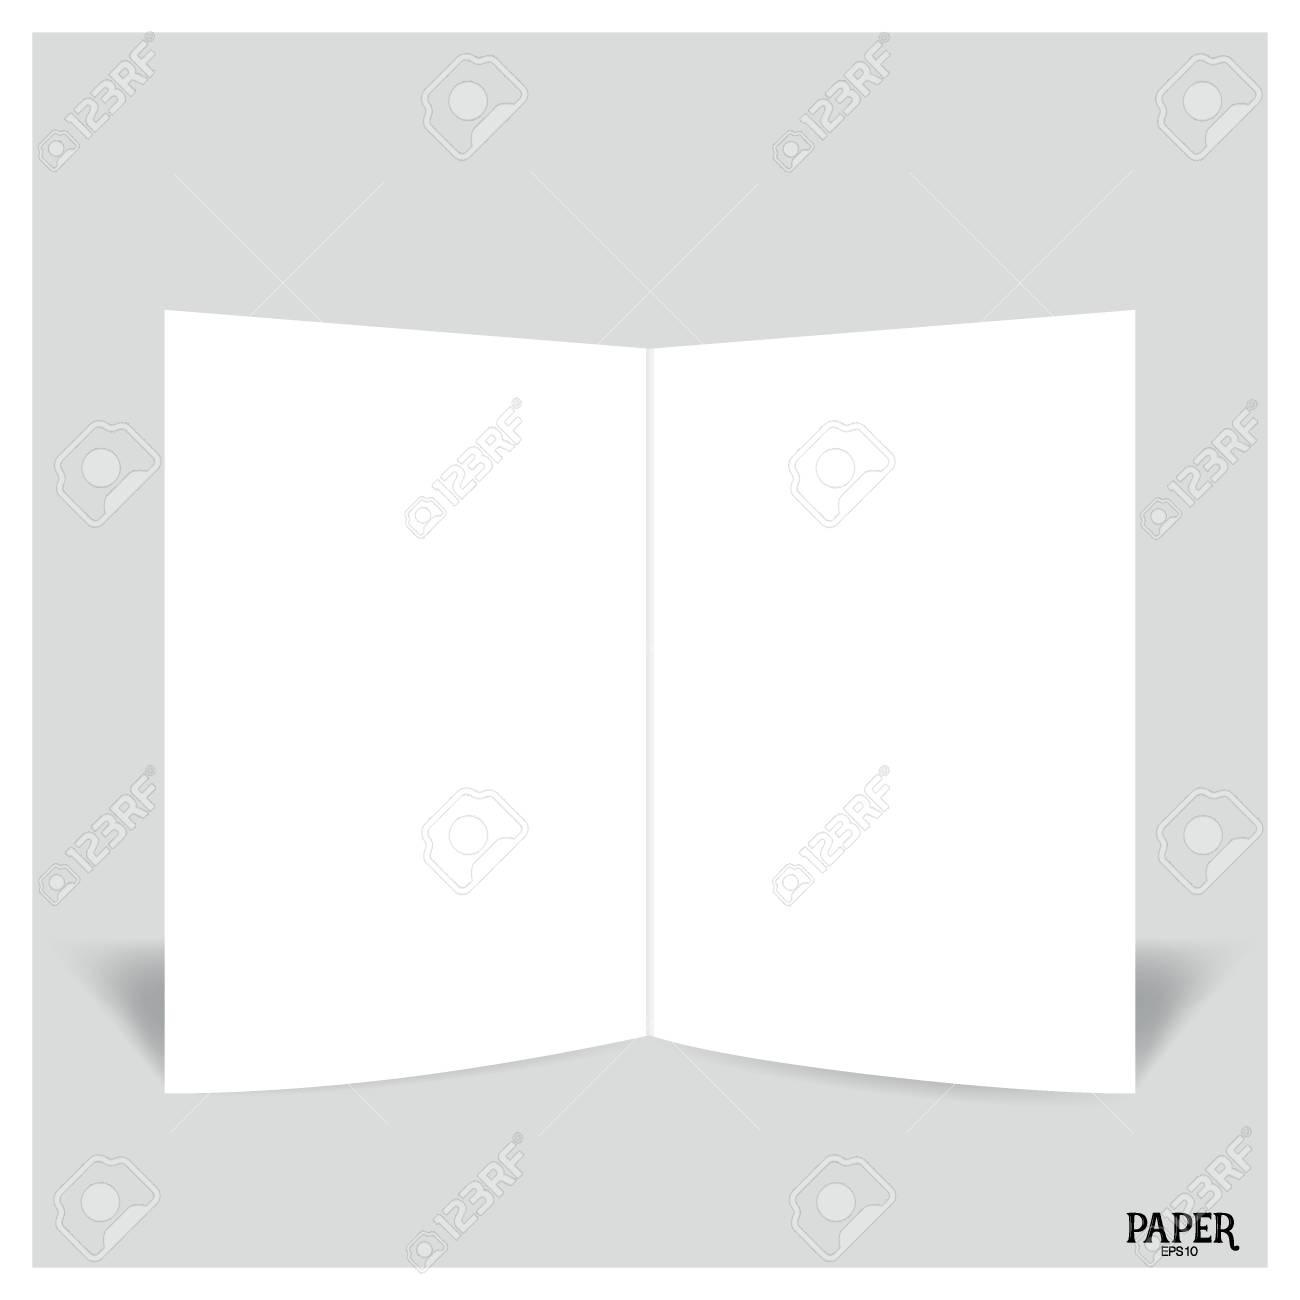 blank two leaf brochures blank bifold paper brochure mockup